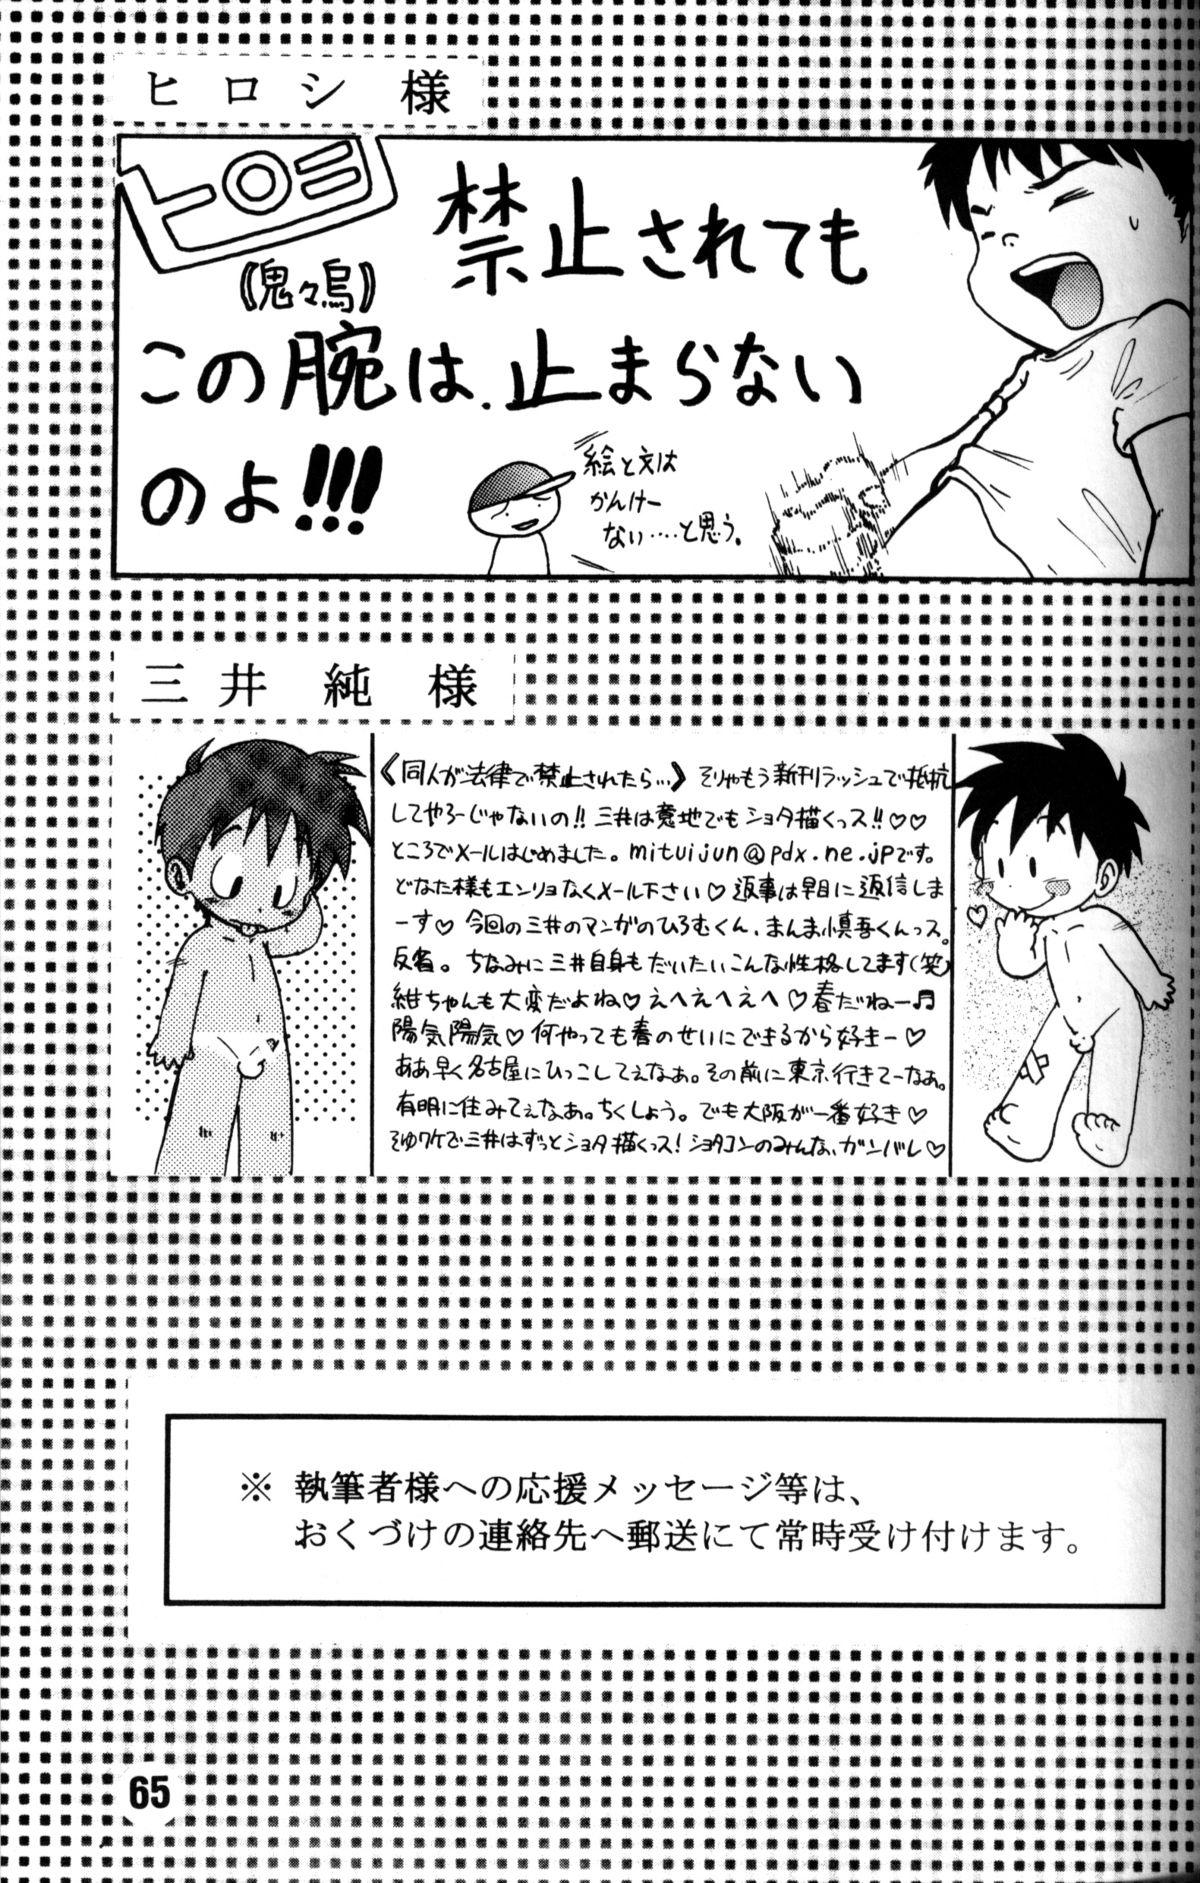 Anthology - Nekketsu Project - Volume 4 'Shounen Vanilla Essence' 63